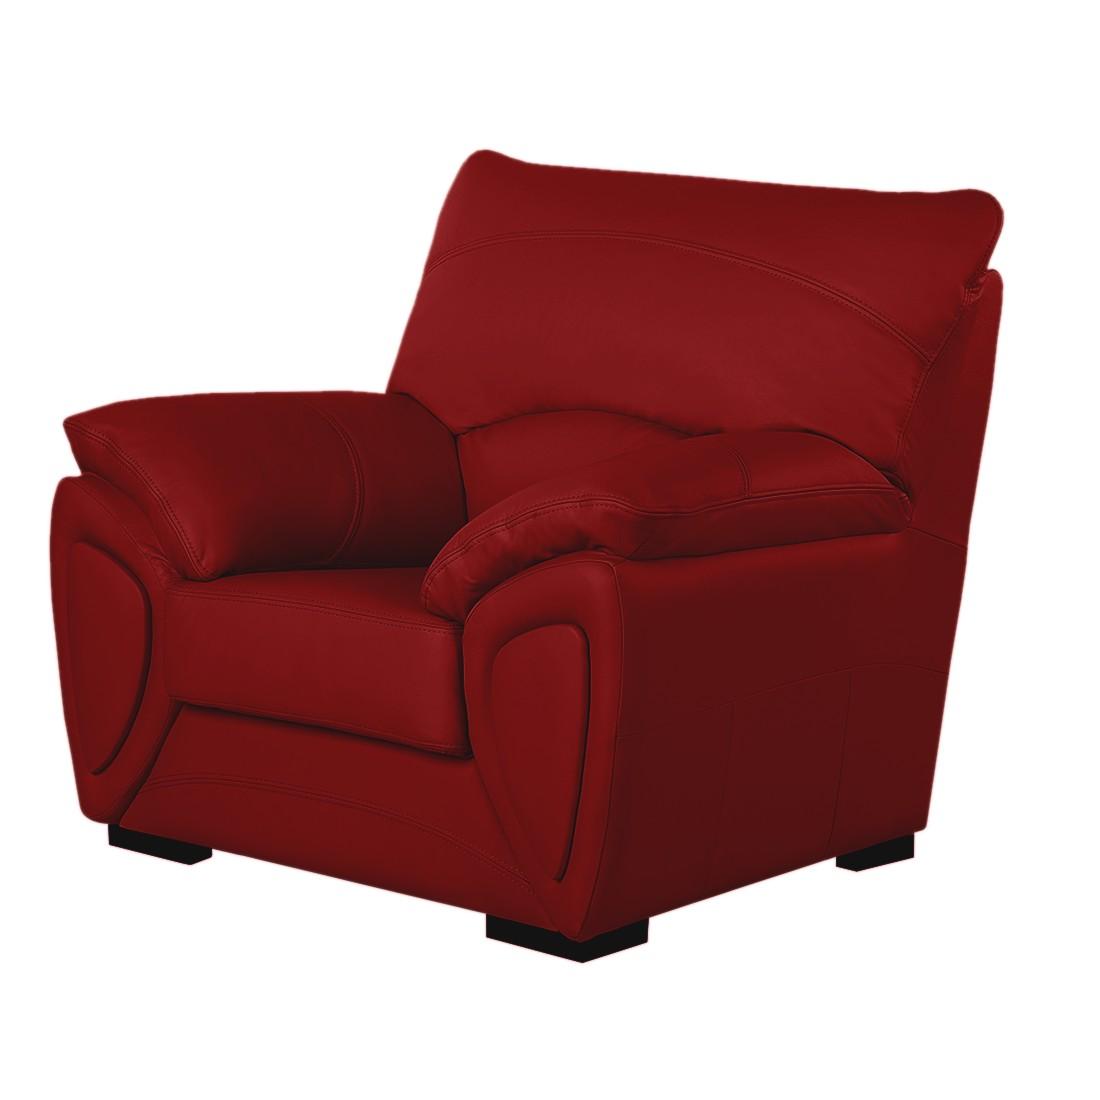 Sessel Luzzi - Echtleder Rot, Nuovoform